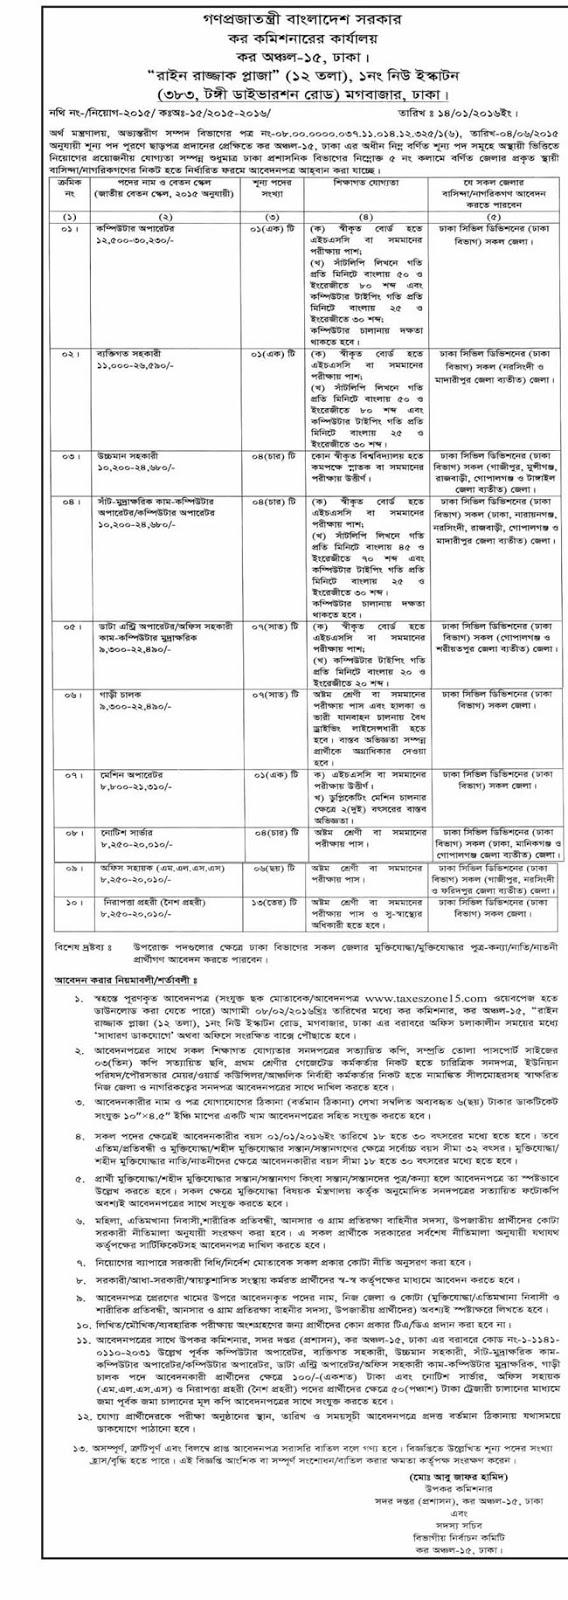 national board of revenue job circular 2016 latest nbr job 2016